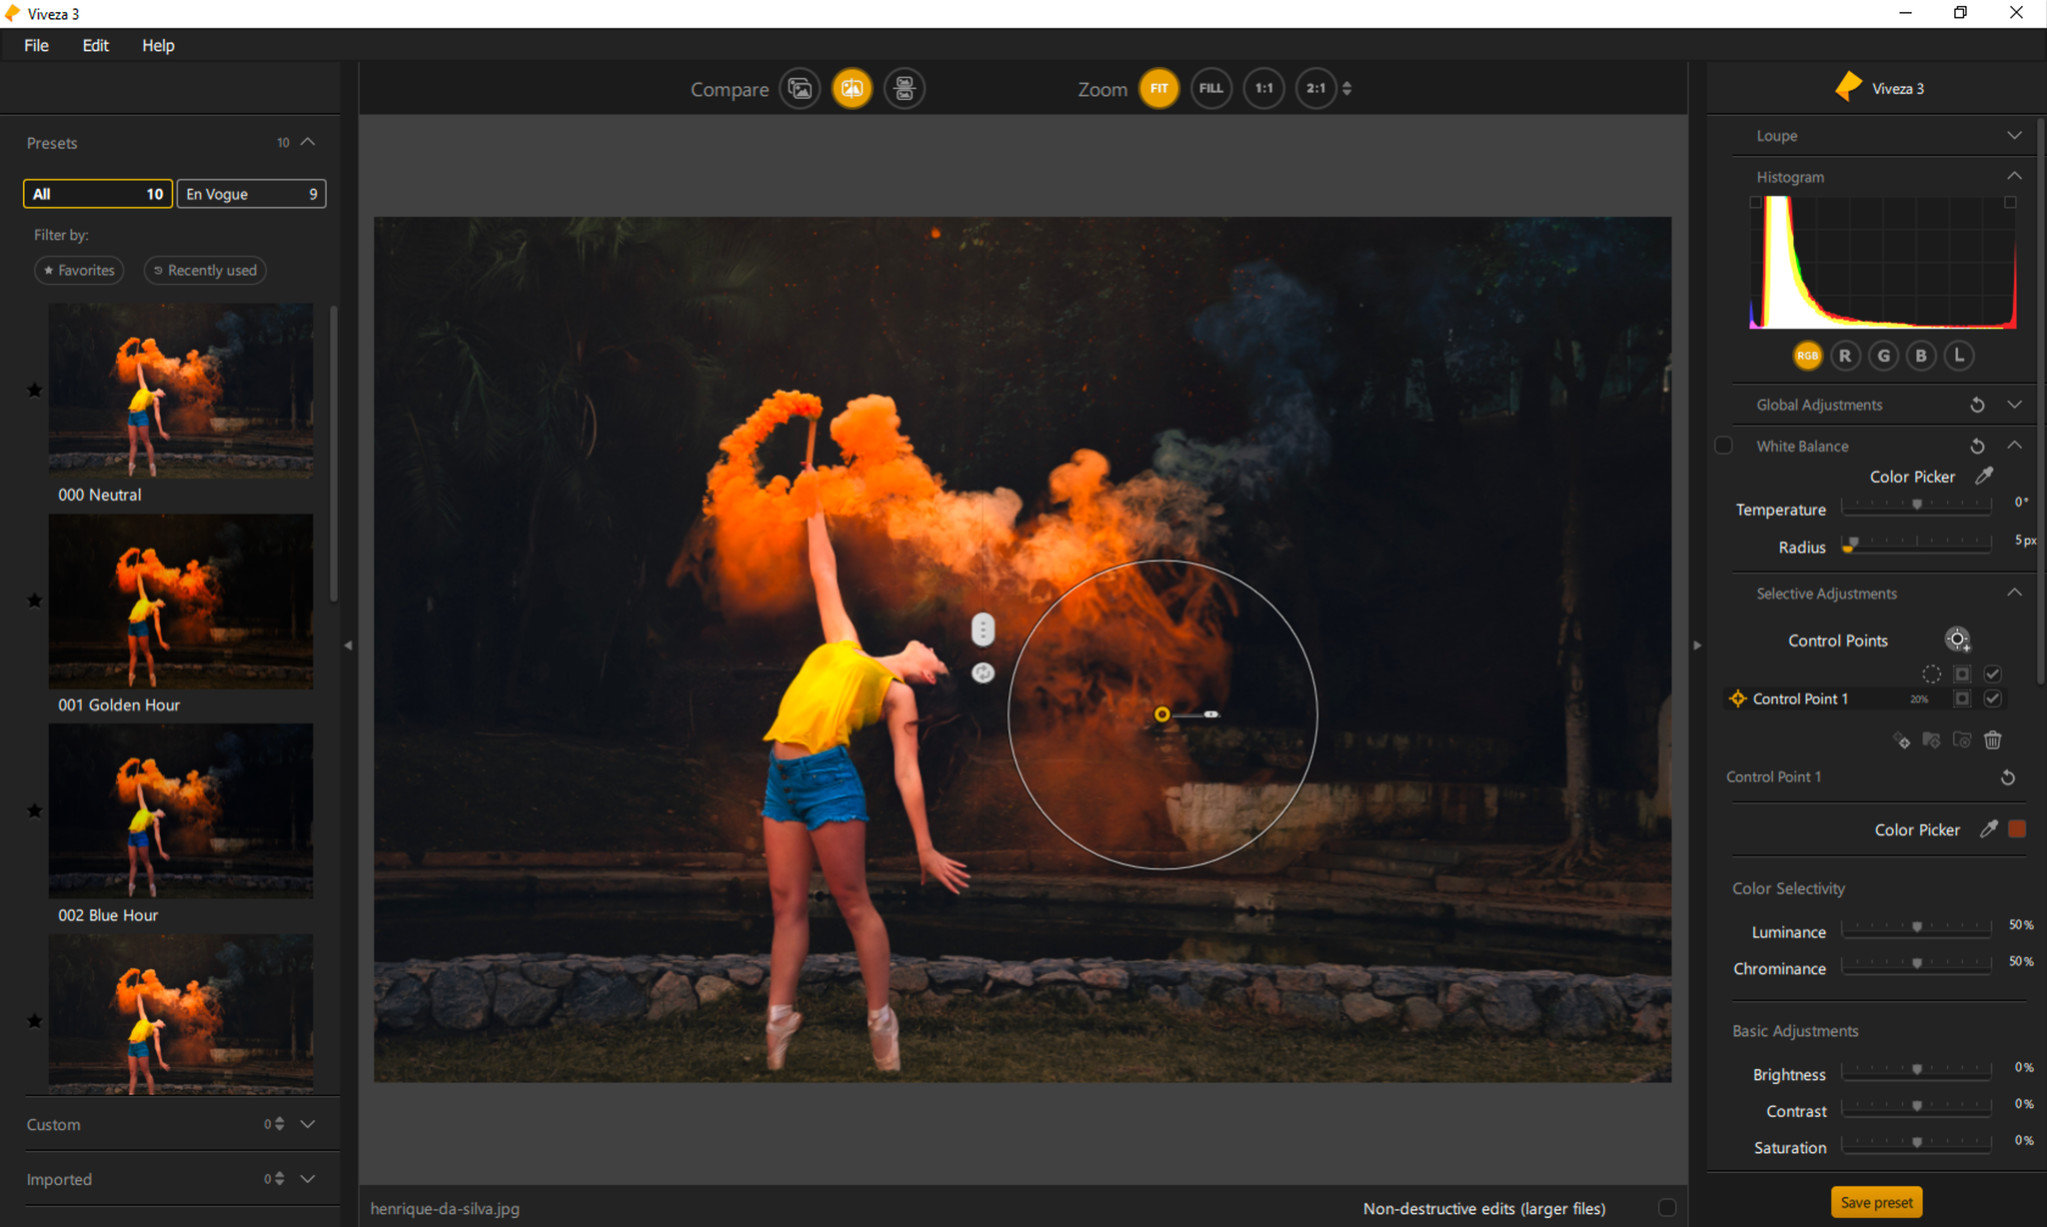 Screenshot 1 - Nik Collection 4 by DxO